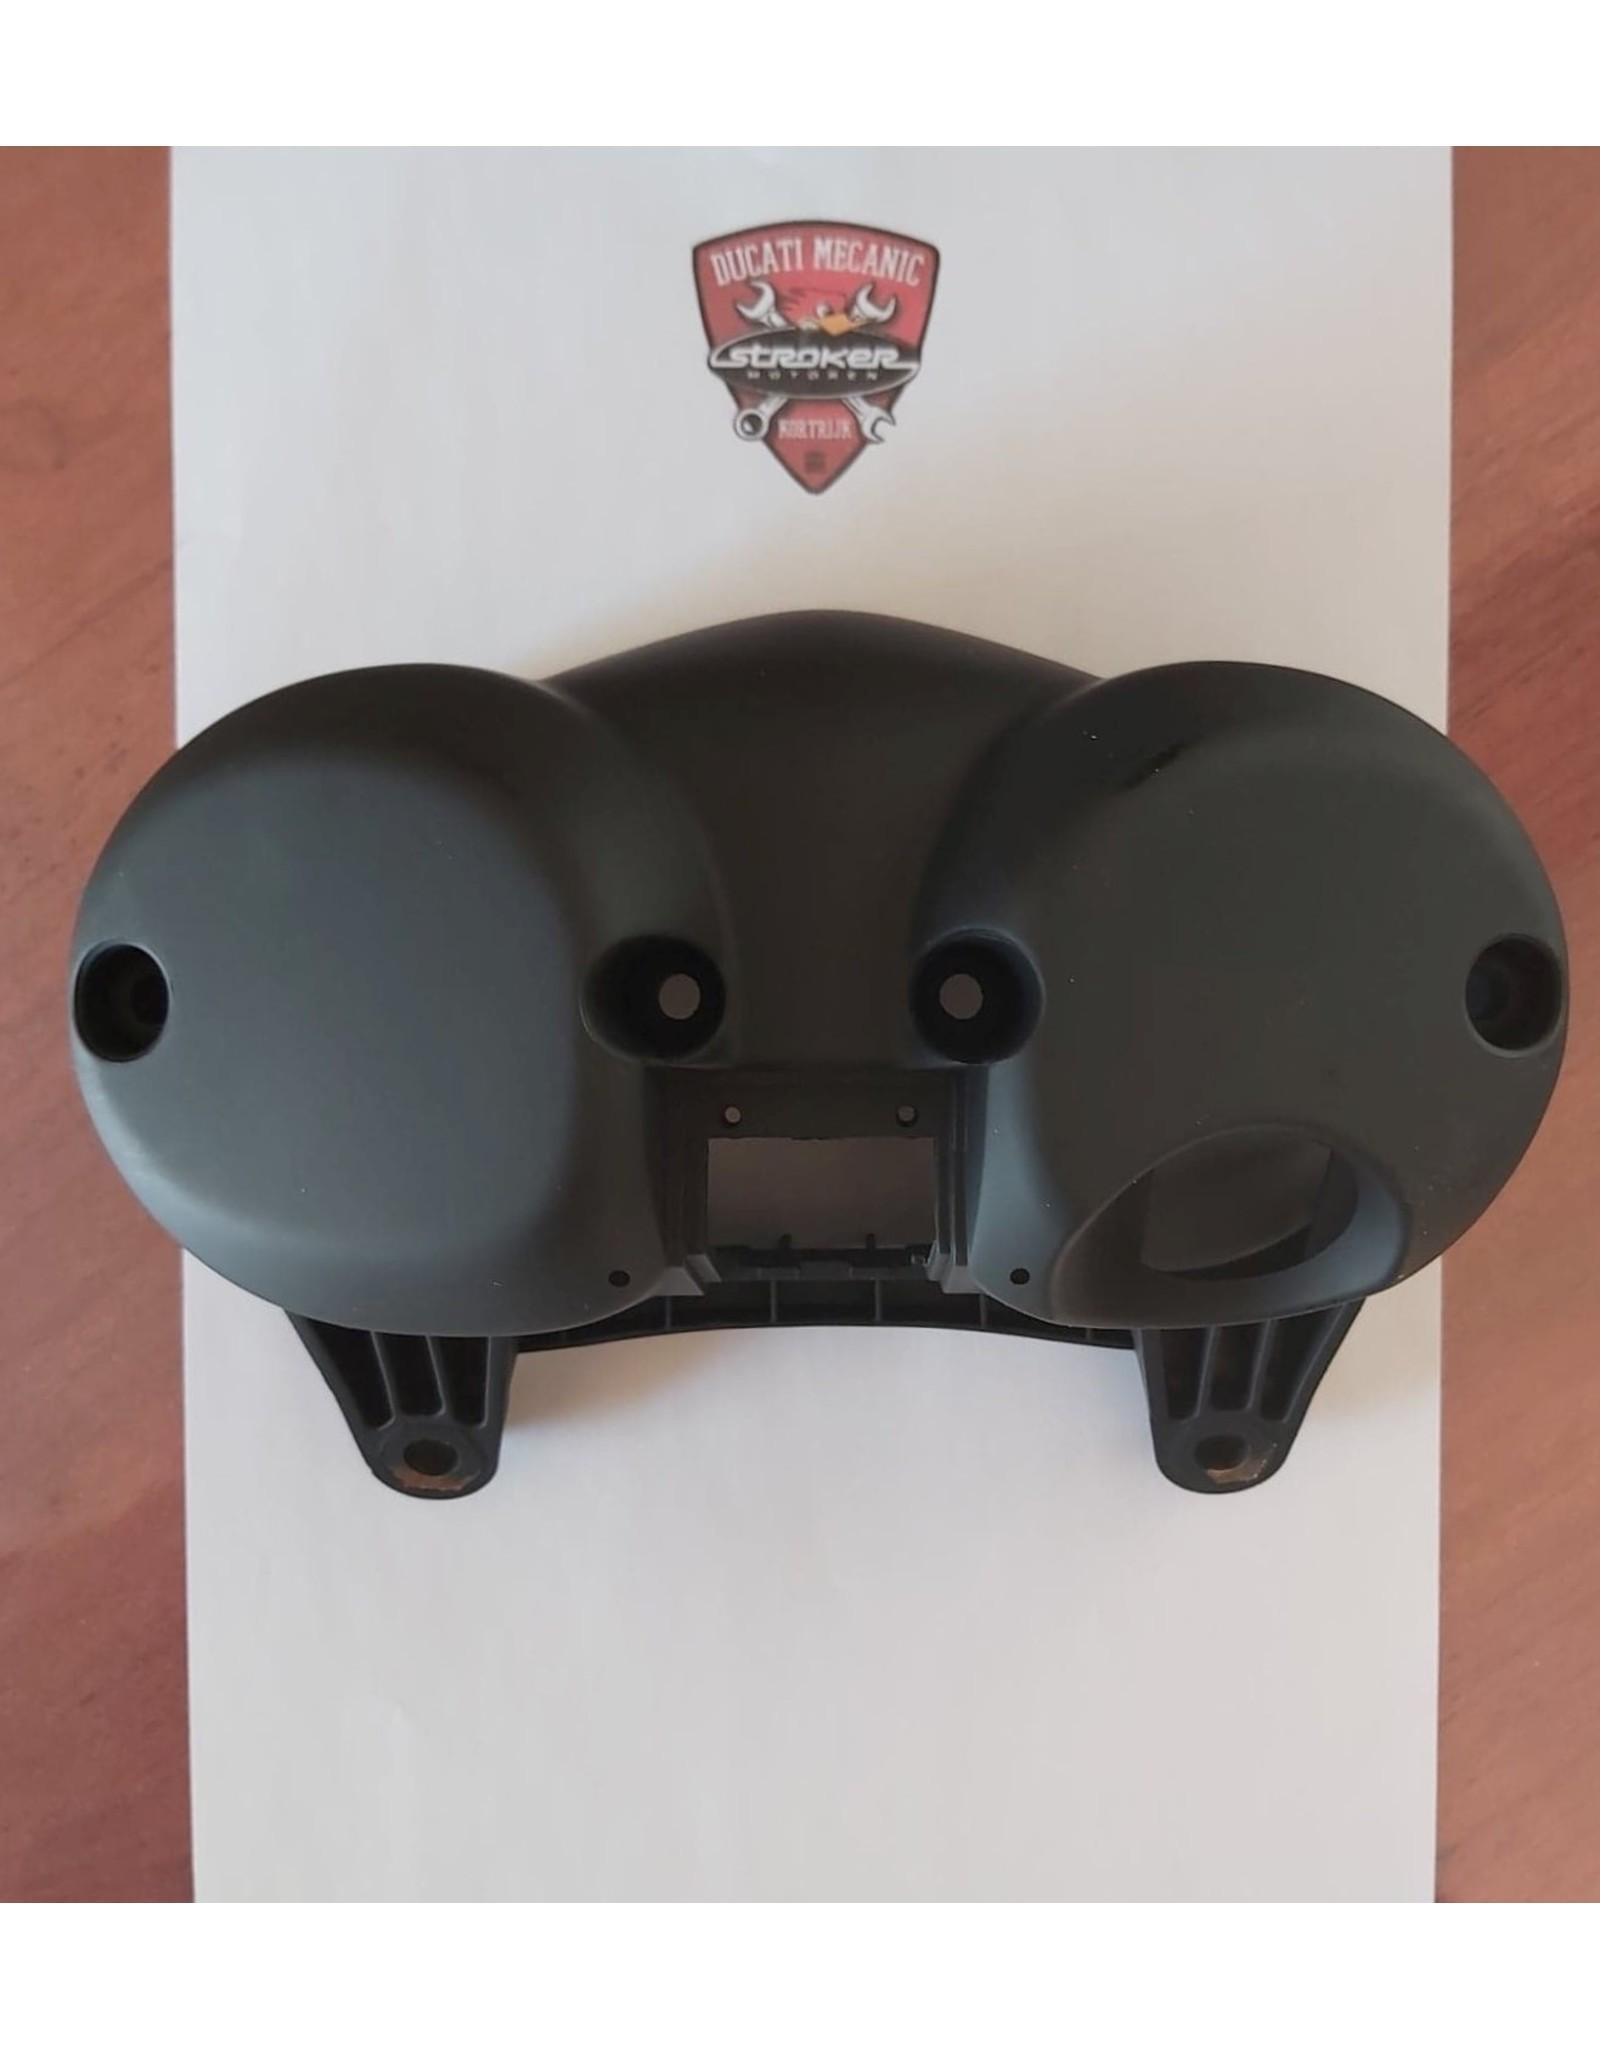 Ducati Ducati Monster 600 750 900 Dashboard Body Housing 40710091A